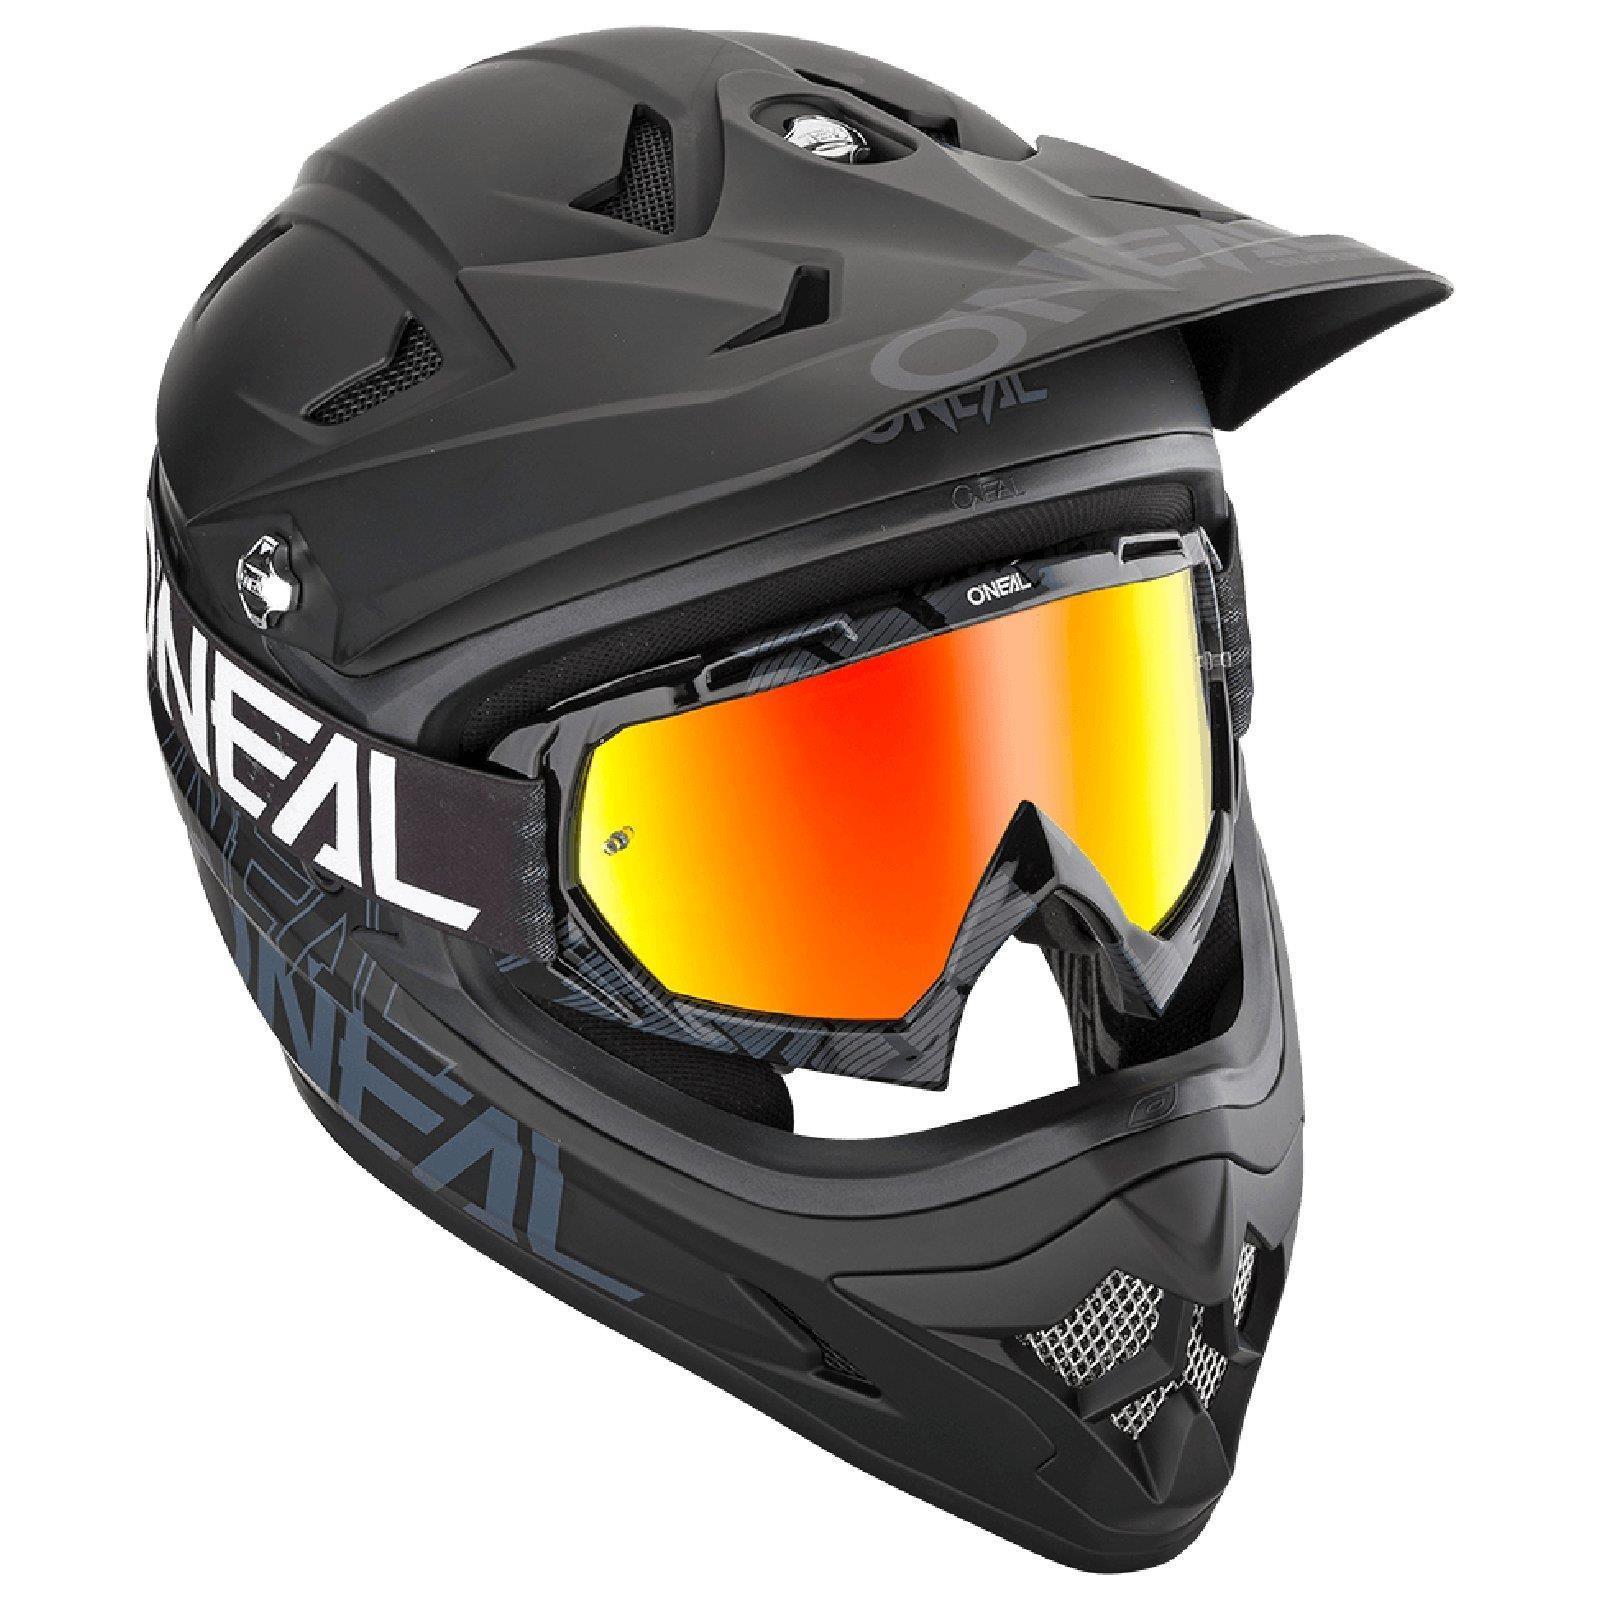 miniatuur 15 - O'Neal B-10 Goggle Pixel Radium Moto Cross Brille Downhill AntiFog Mountainbike